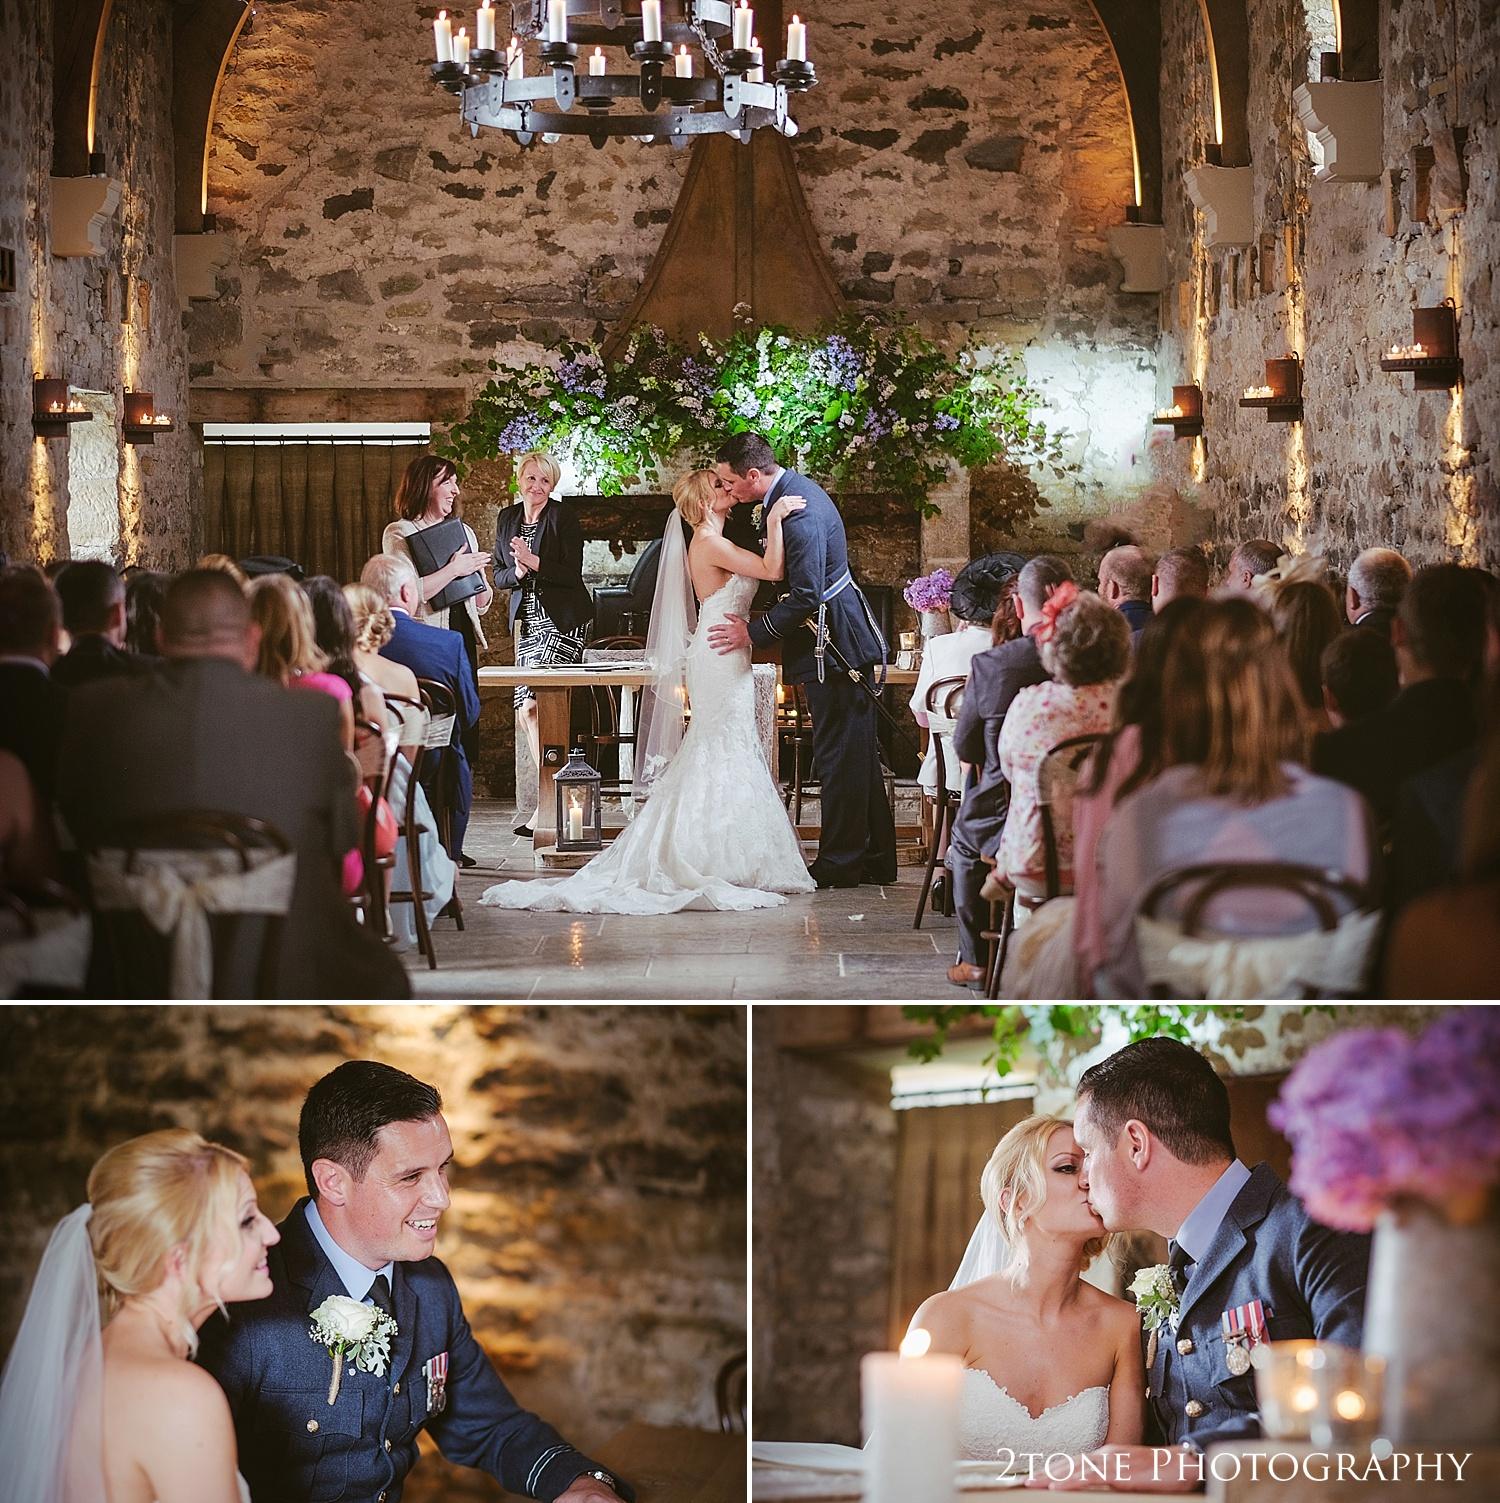 Healey Barn wedding ceremony by wedding photography team 2tone Photography www.2tonephotography.co.uk